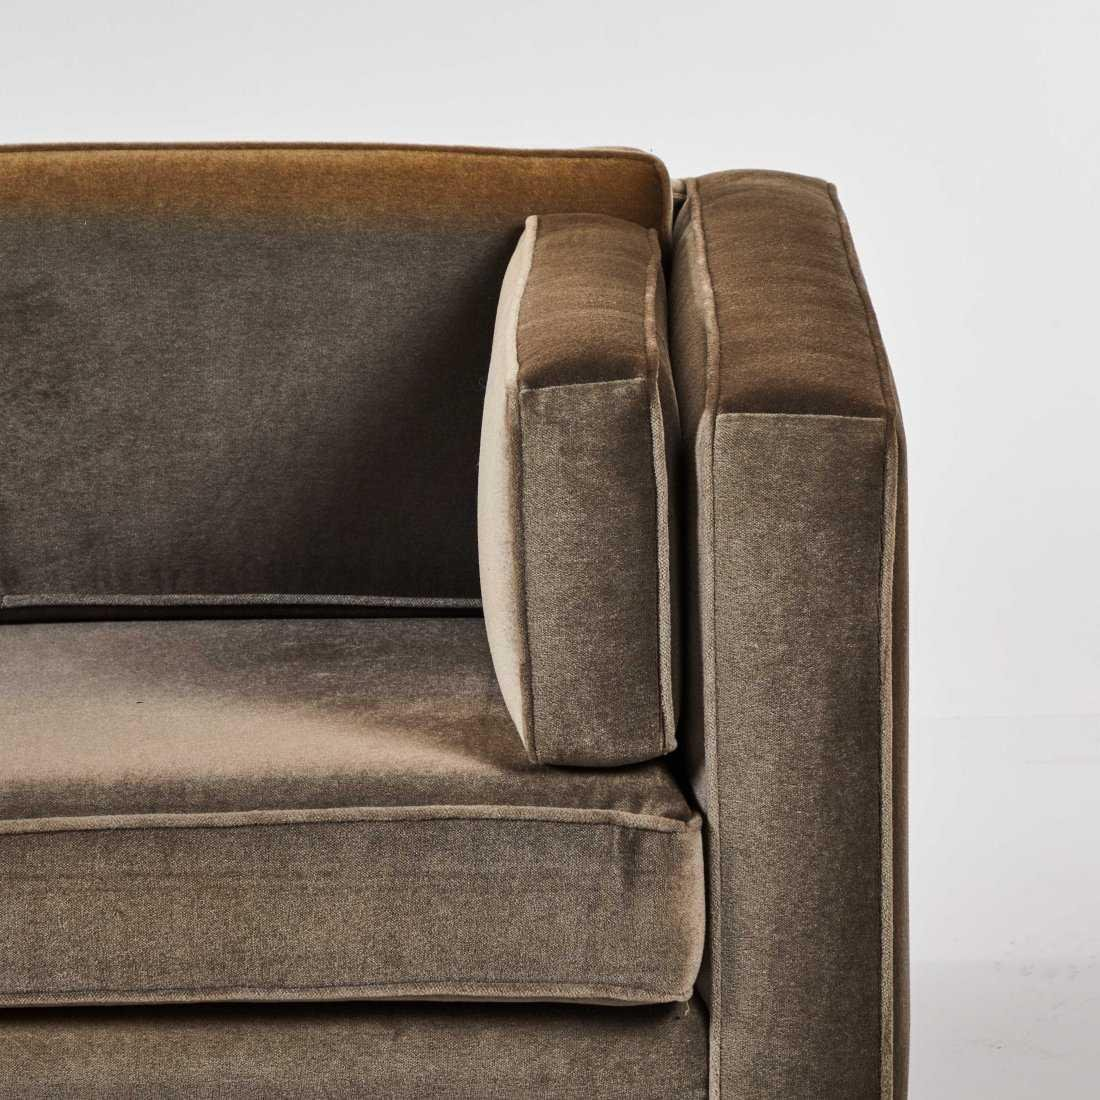 Modernist Mohair Sofa - 6